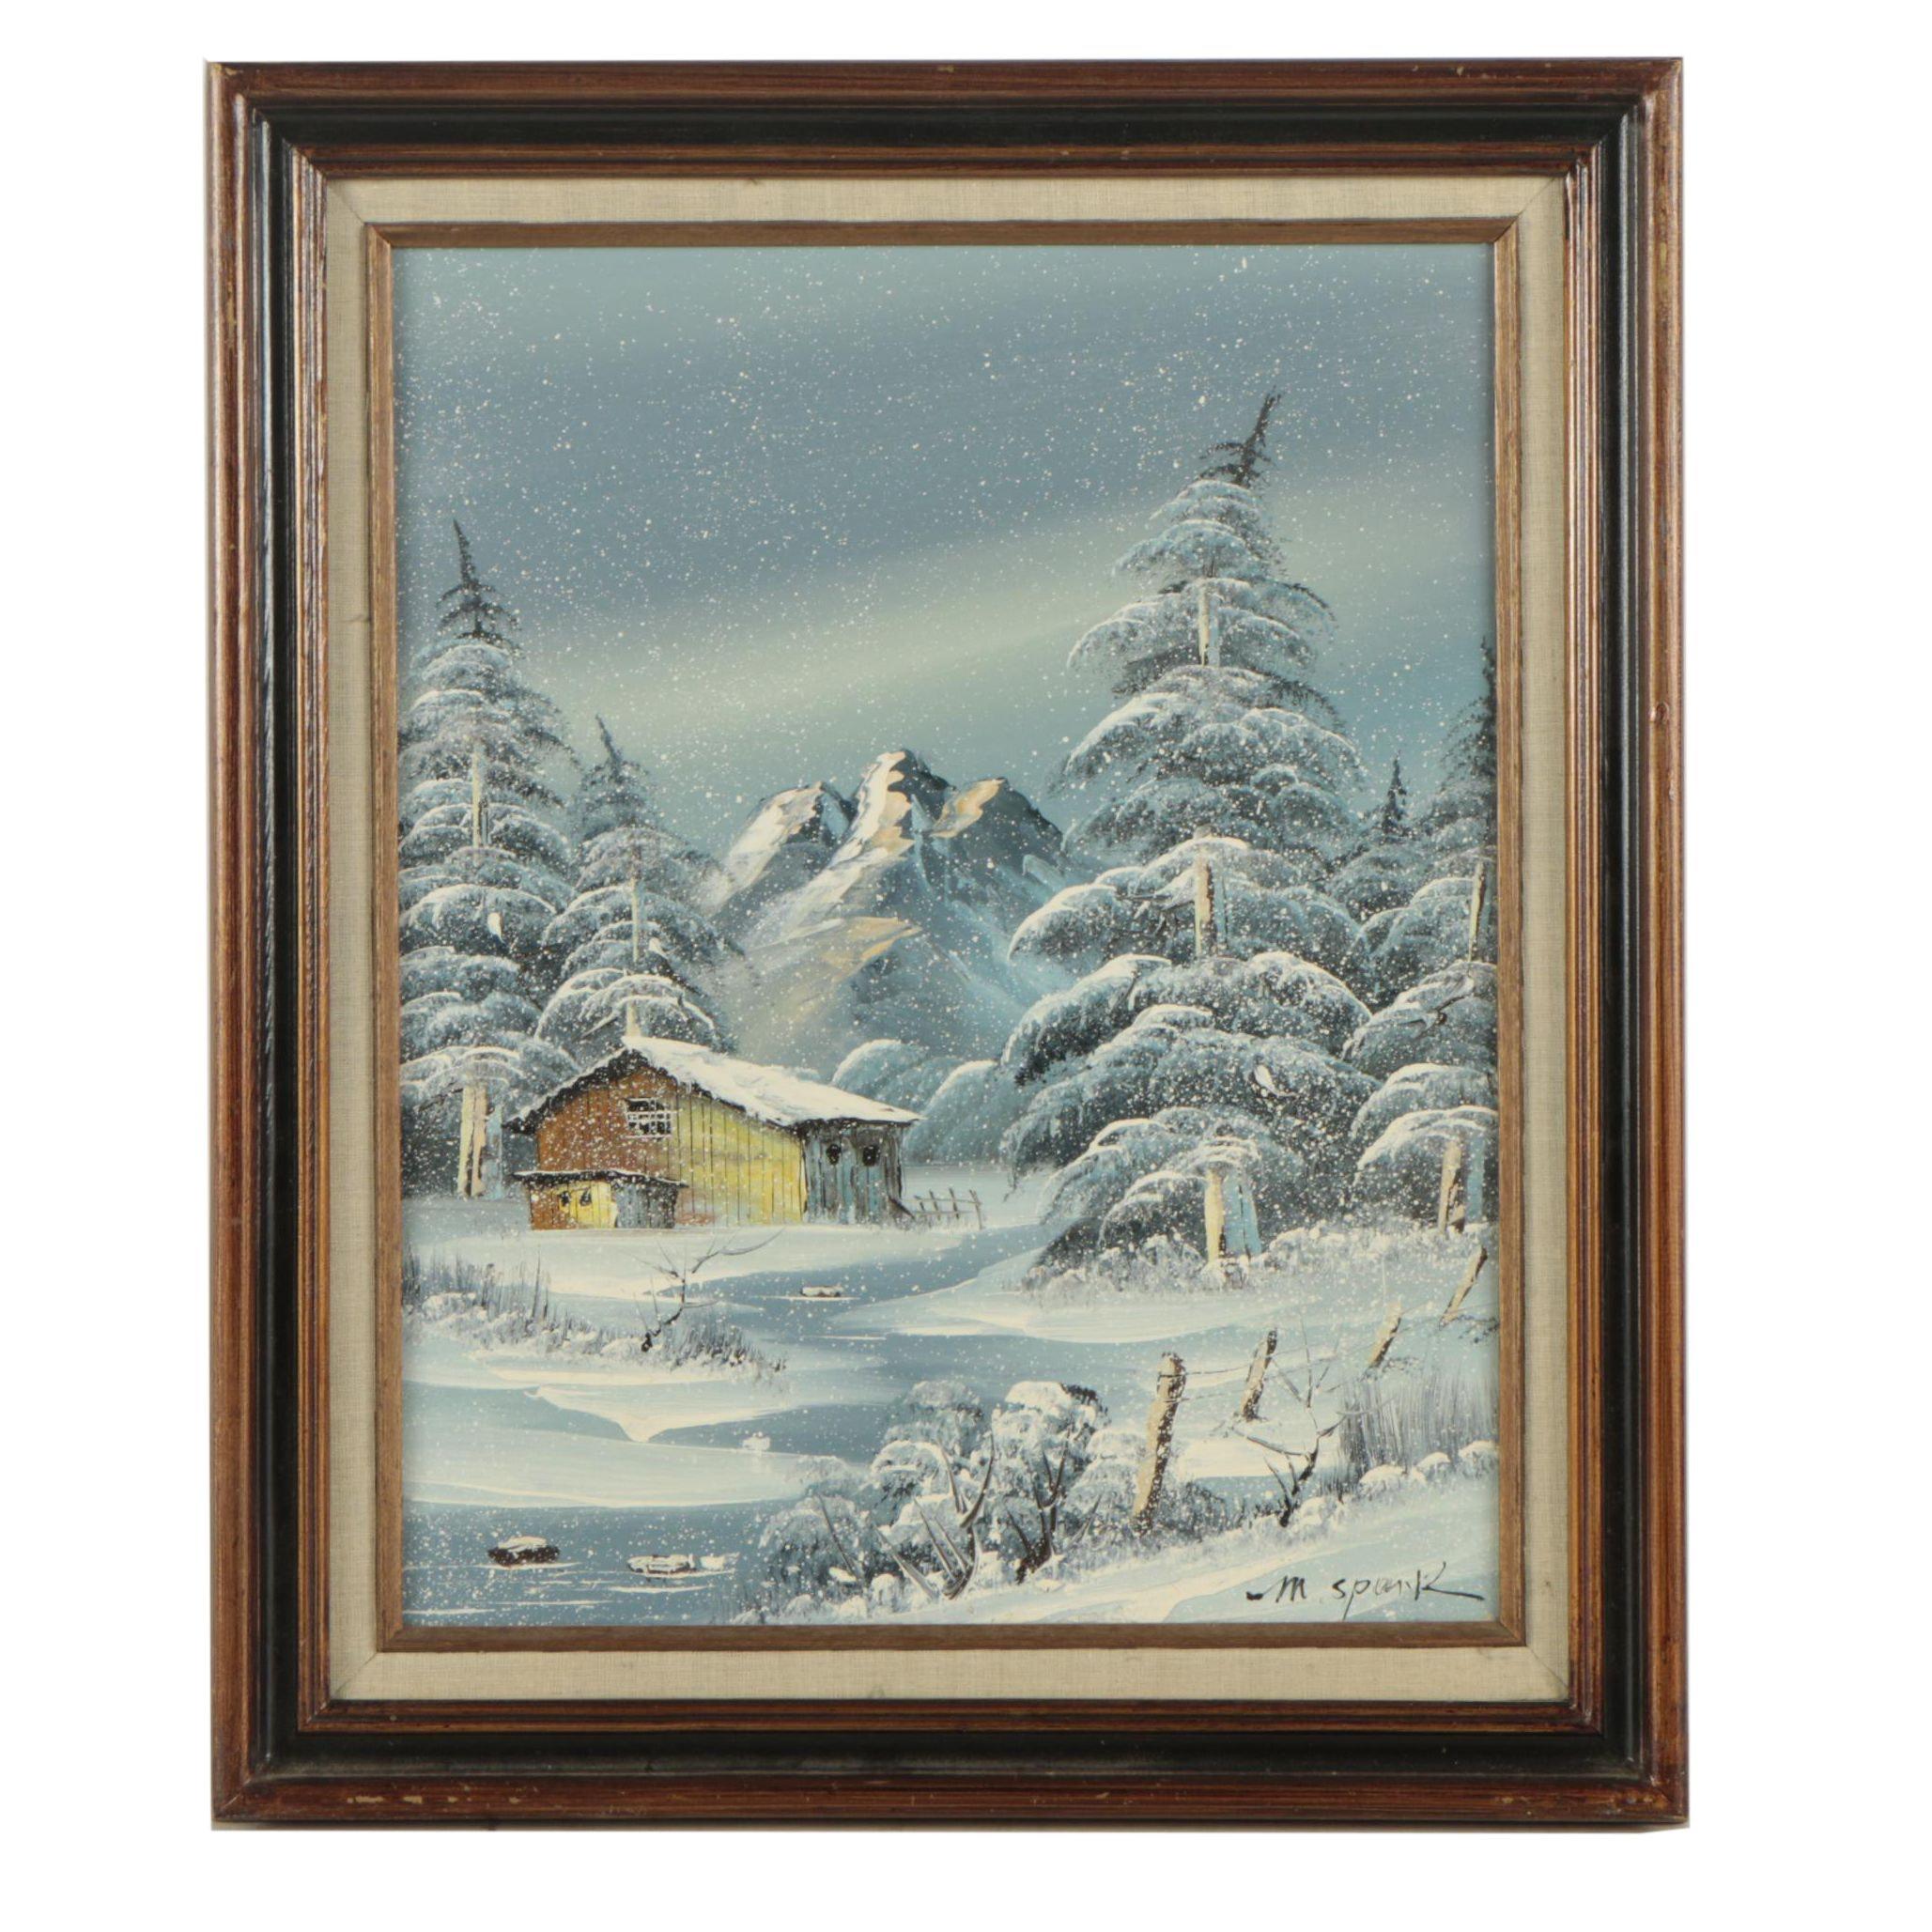 M. Spark Oil Painting of Winter Landscape